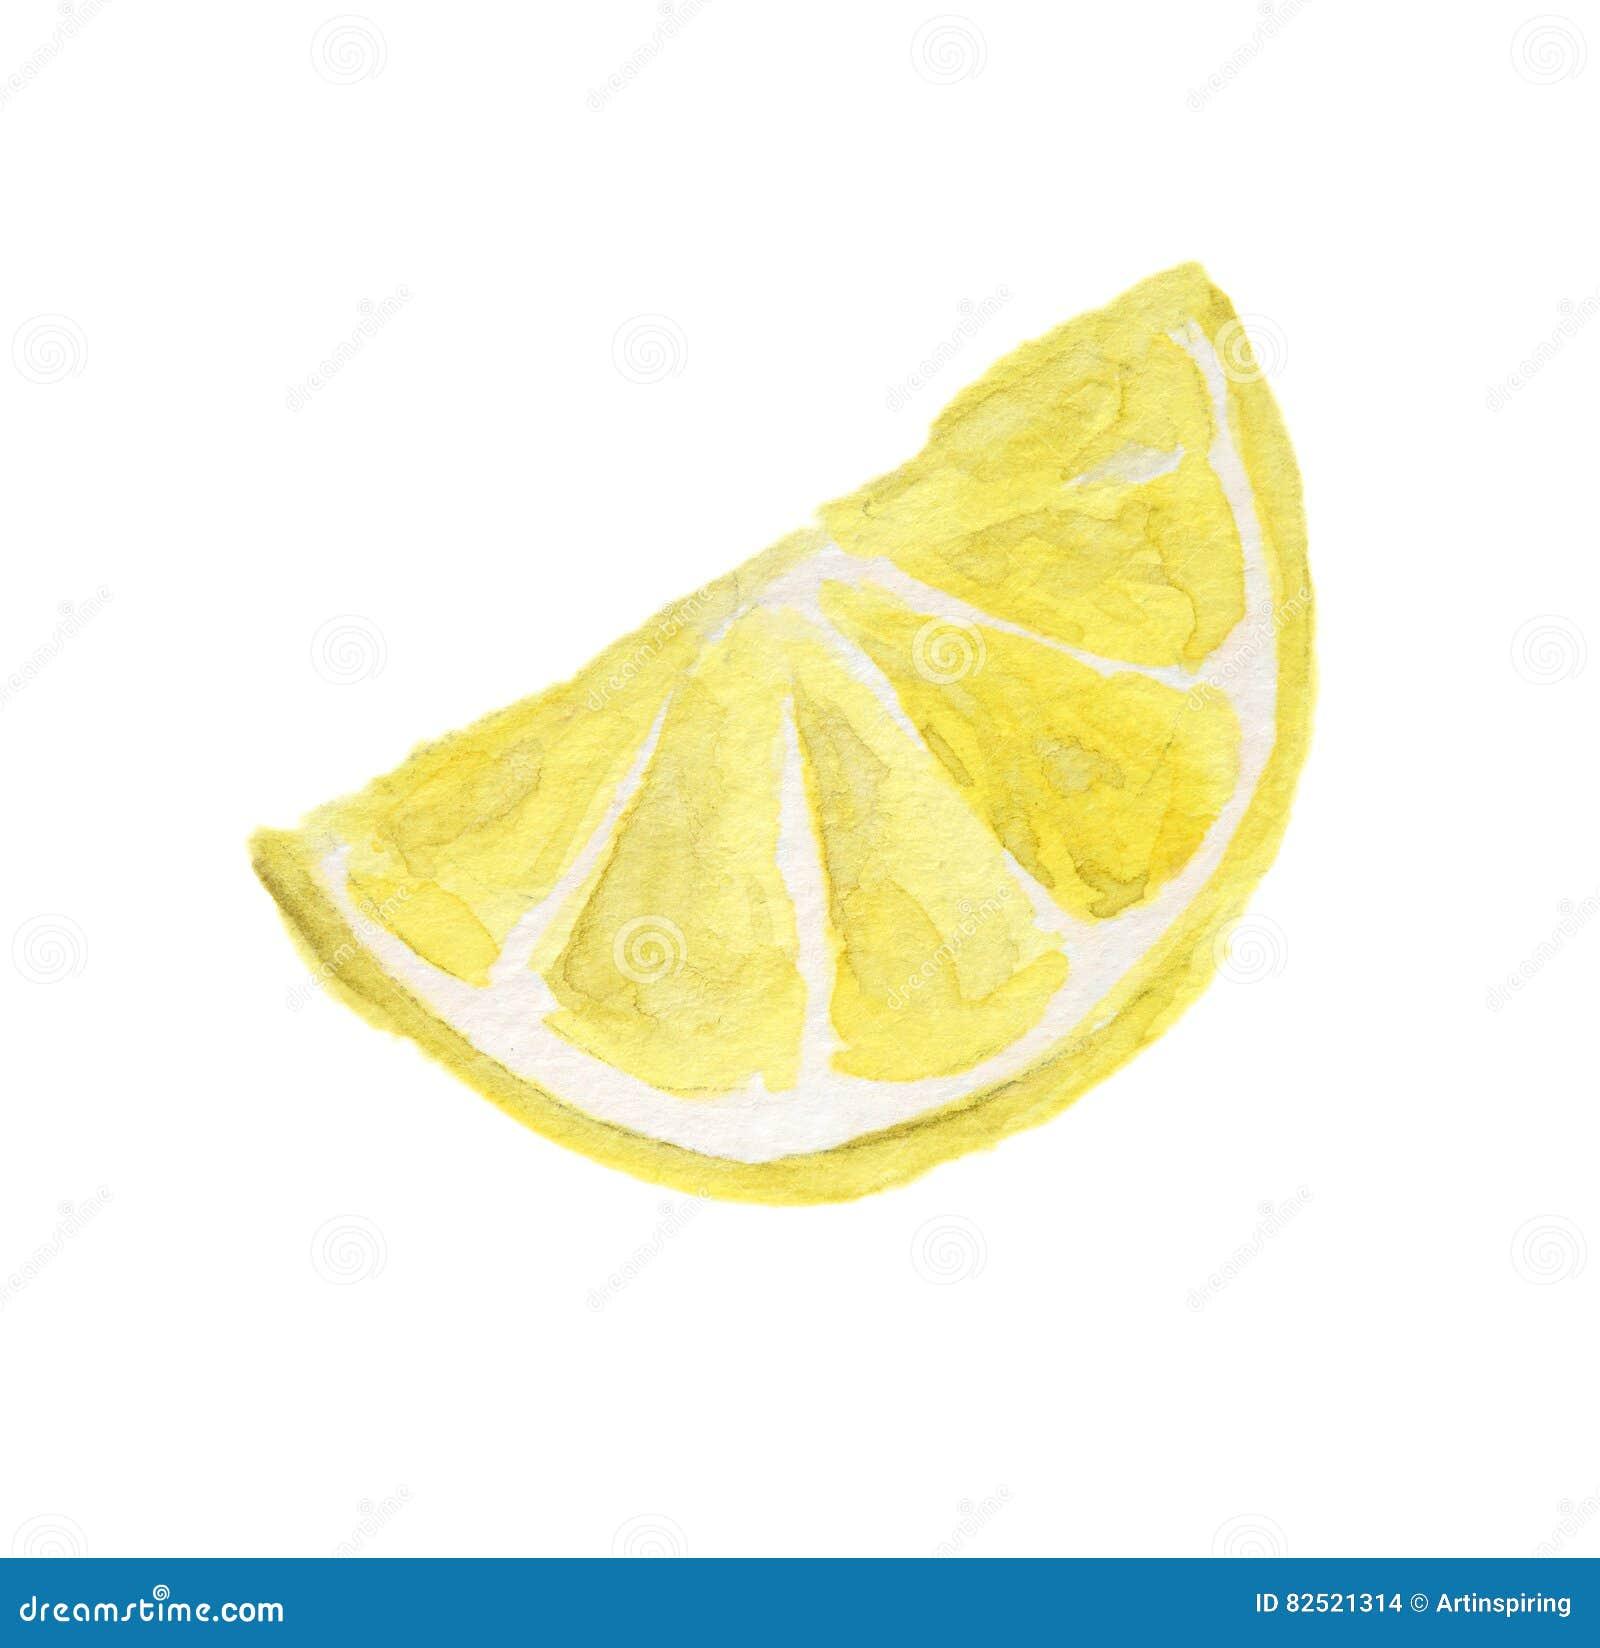 watercolor lemon slice stock illustration illustration of isolated